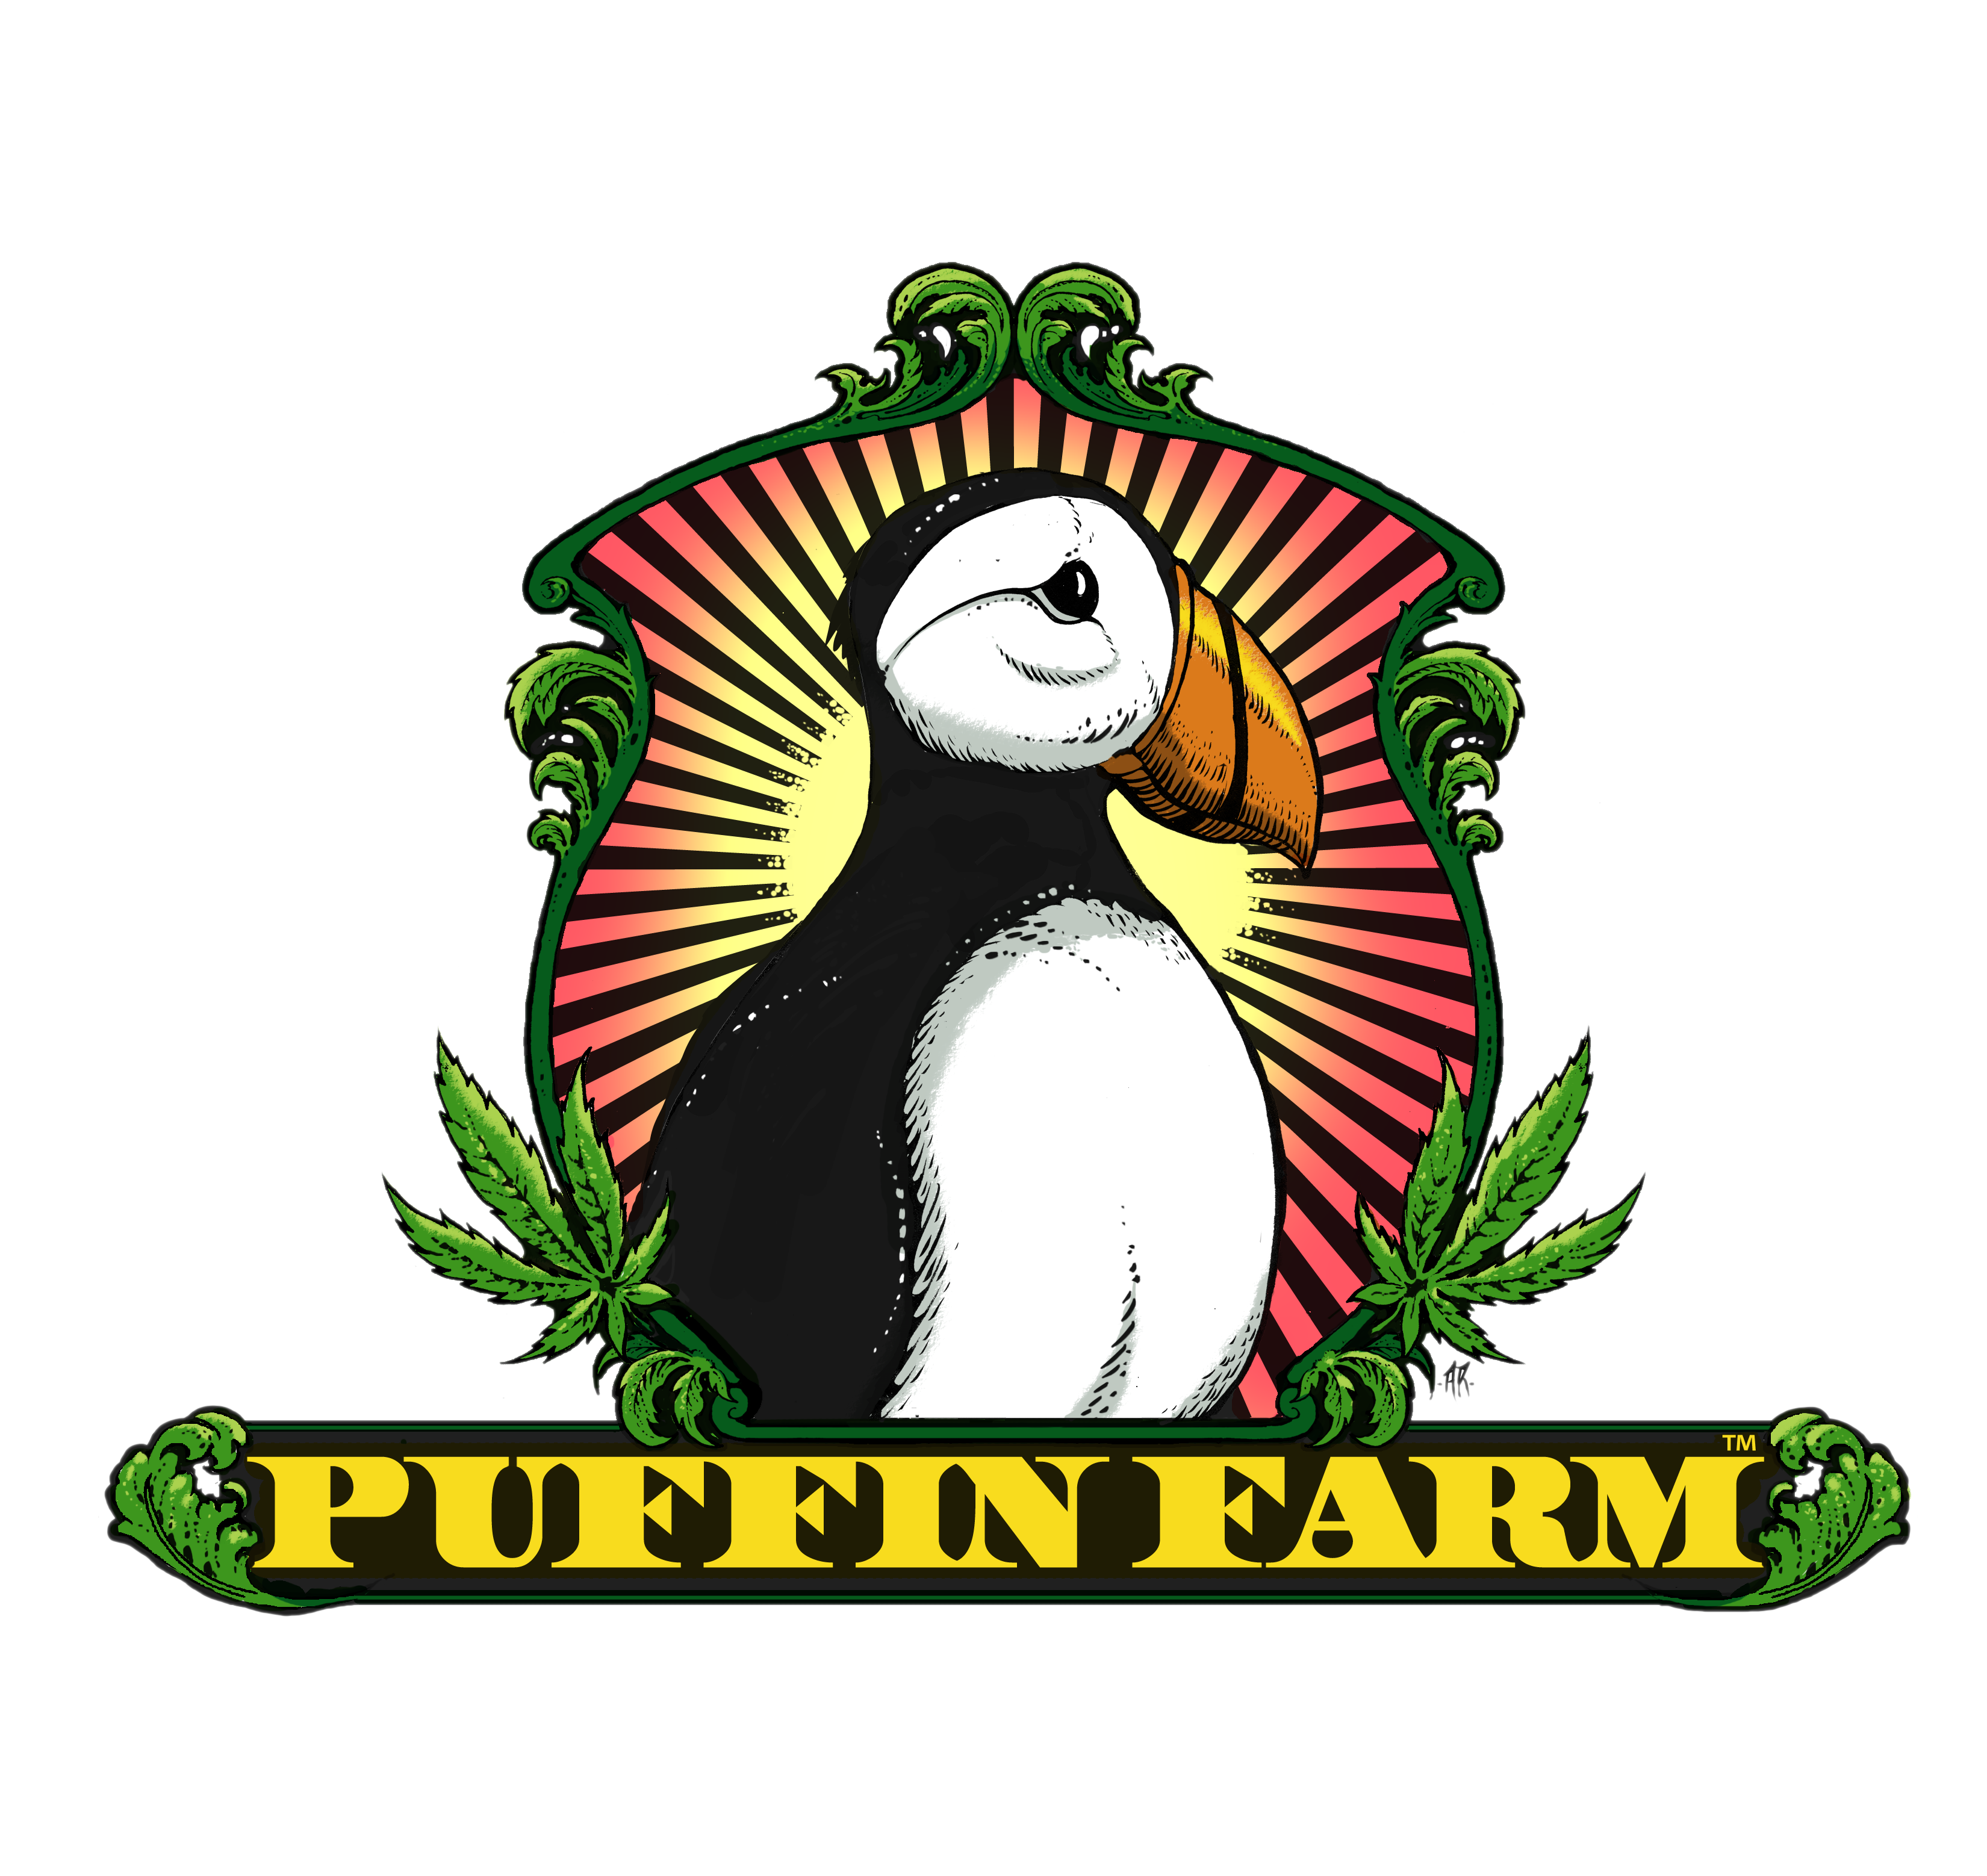 Puffin farm i processor. Farmers clipart producer economics